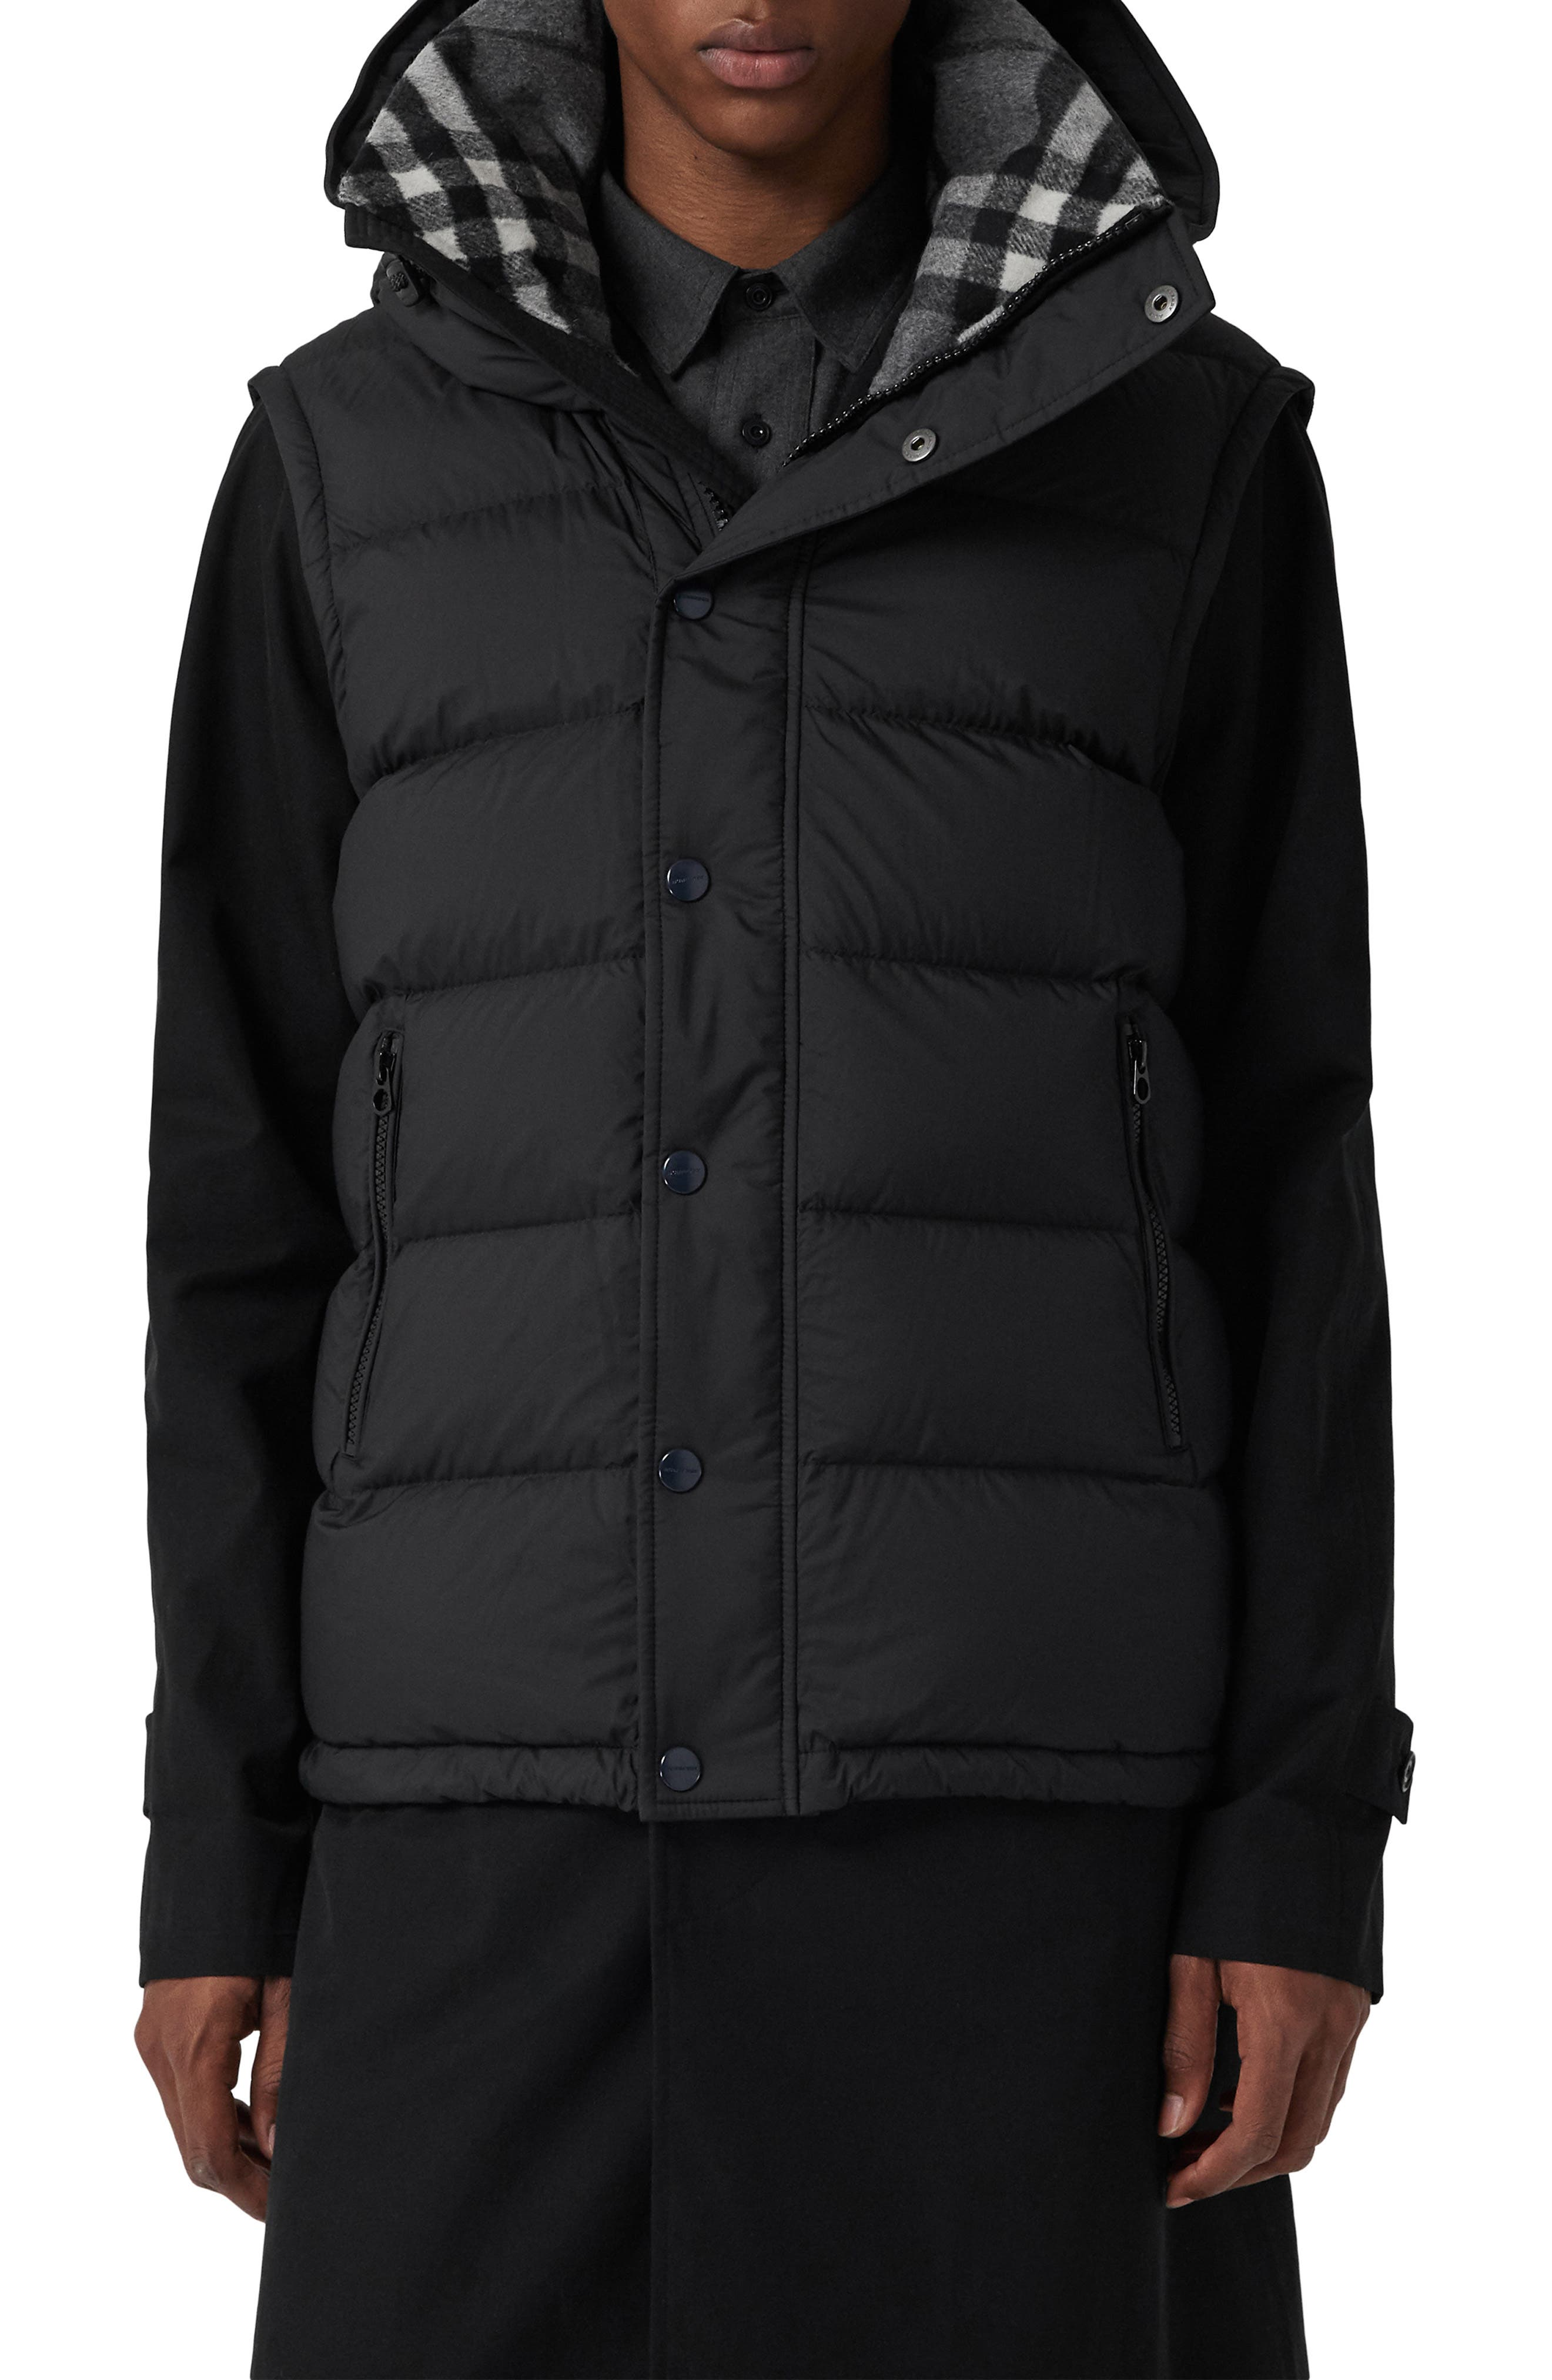 Hartley Hybrid Jacket with Detachable Sleeves,                             Alternate thumbnail 2, color,                             001